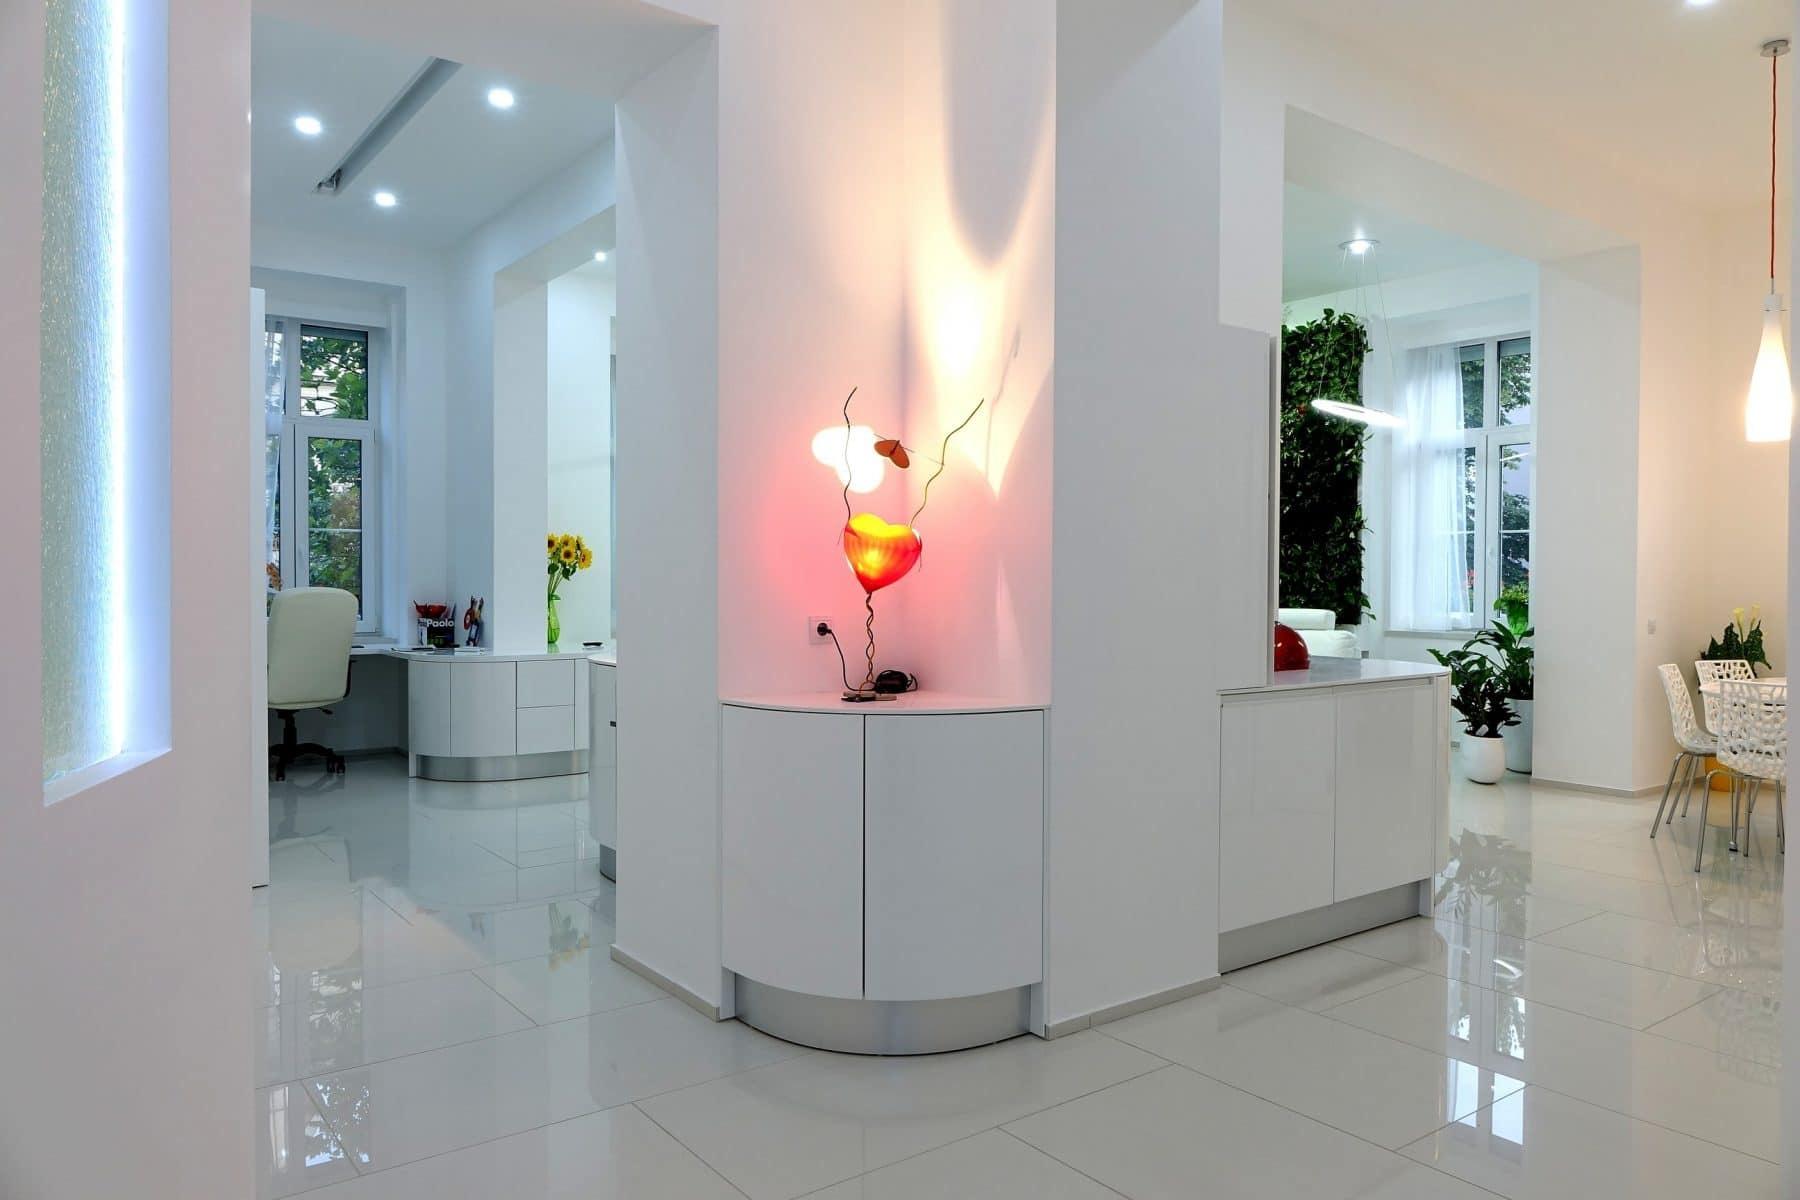 halasz-utca-modern-design-apartment-budapest-dsc00432_filtered